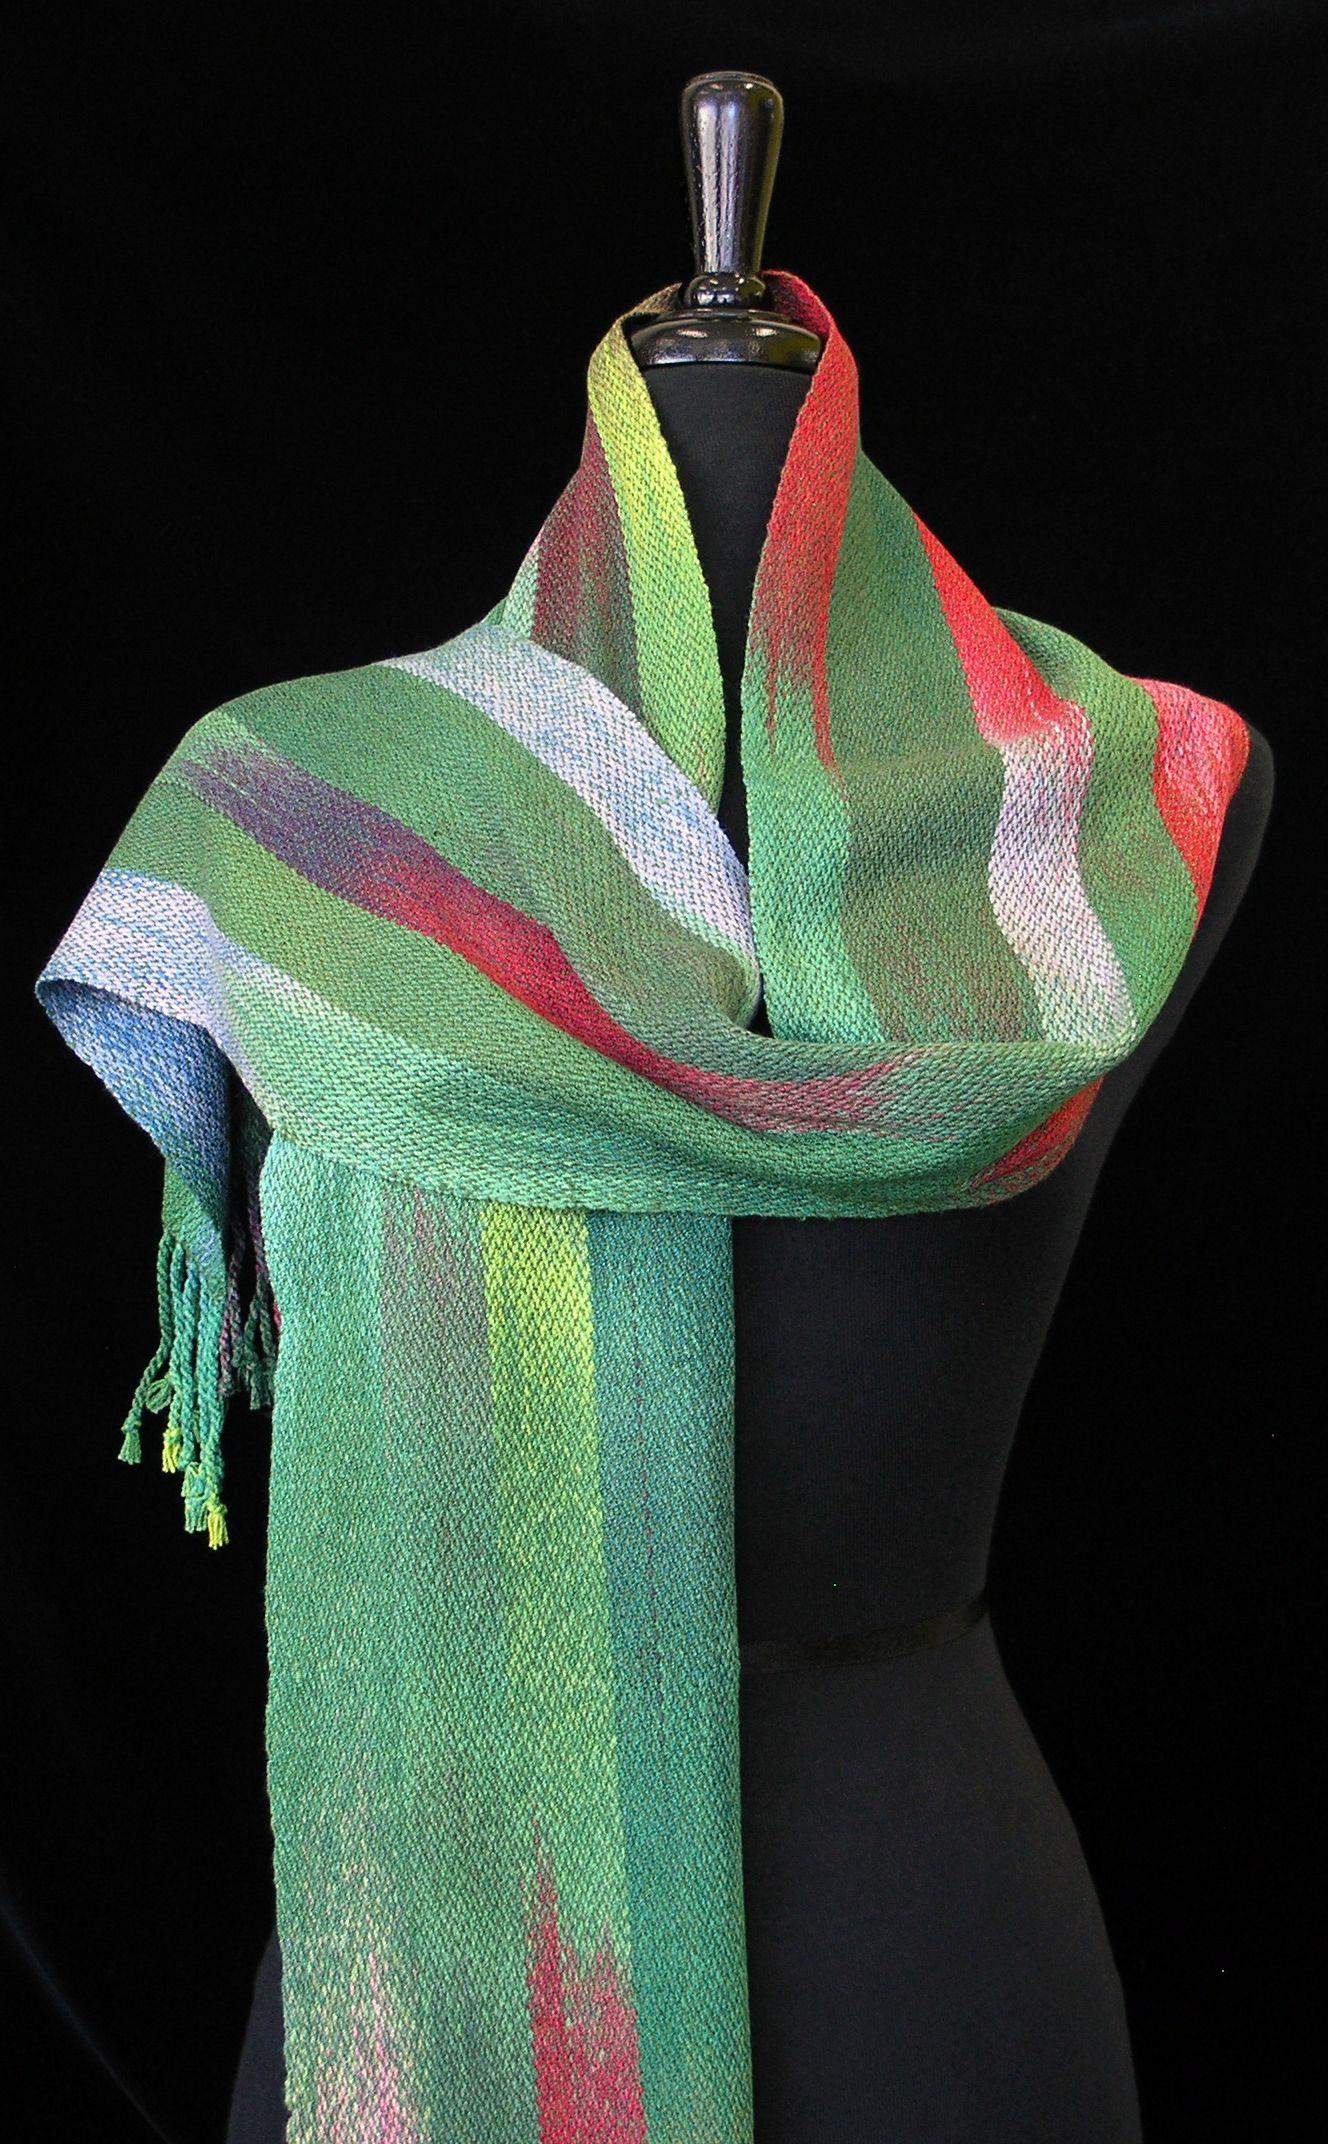 Handwoven scarf by Geri Retzlaff. photo by Aimee Radman